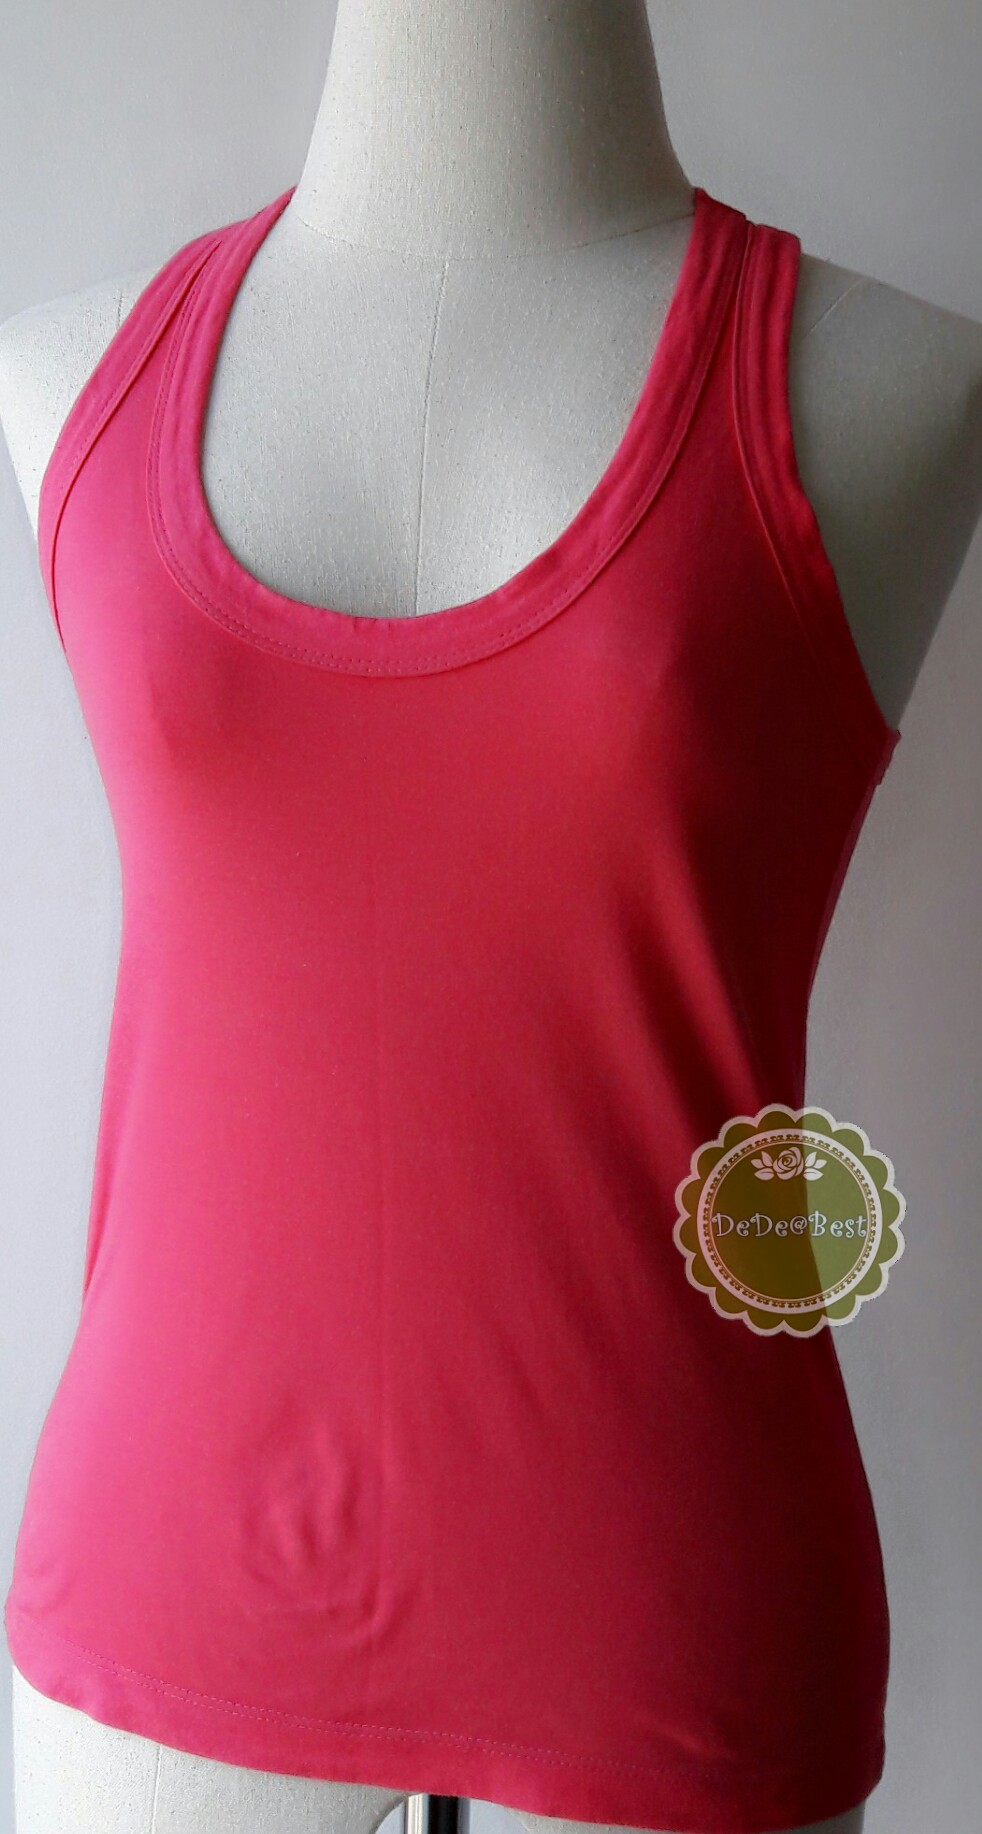 T90:2nd hand top เสื้อกล้ามสีชมพูสดใส